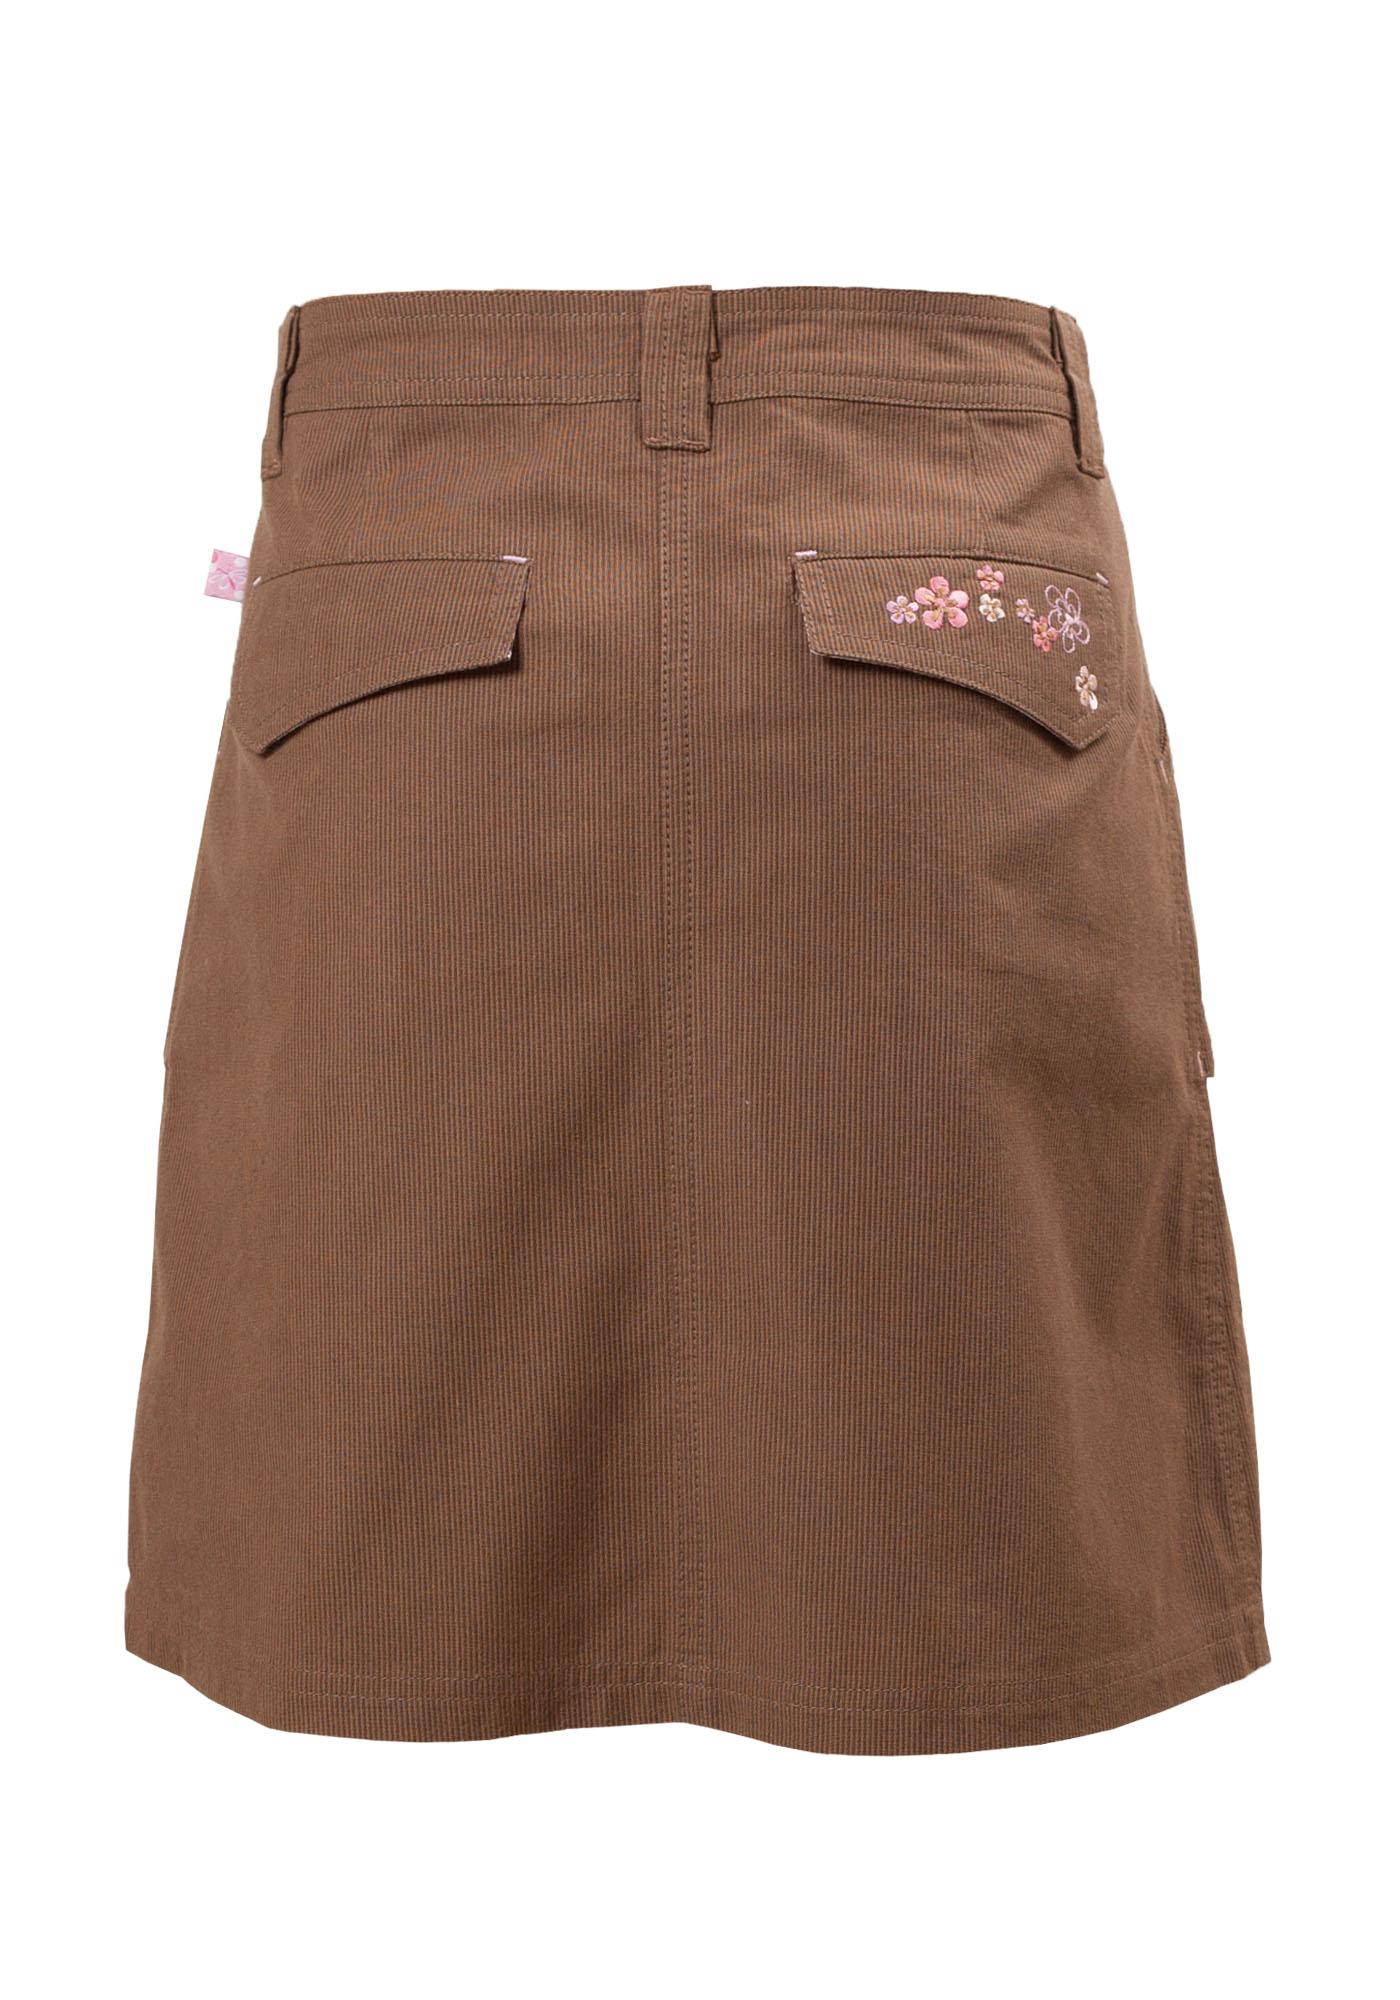 MINC Petite Autumn Fun Girls Embroidered Skirt in Brown Corduroy